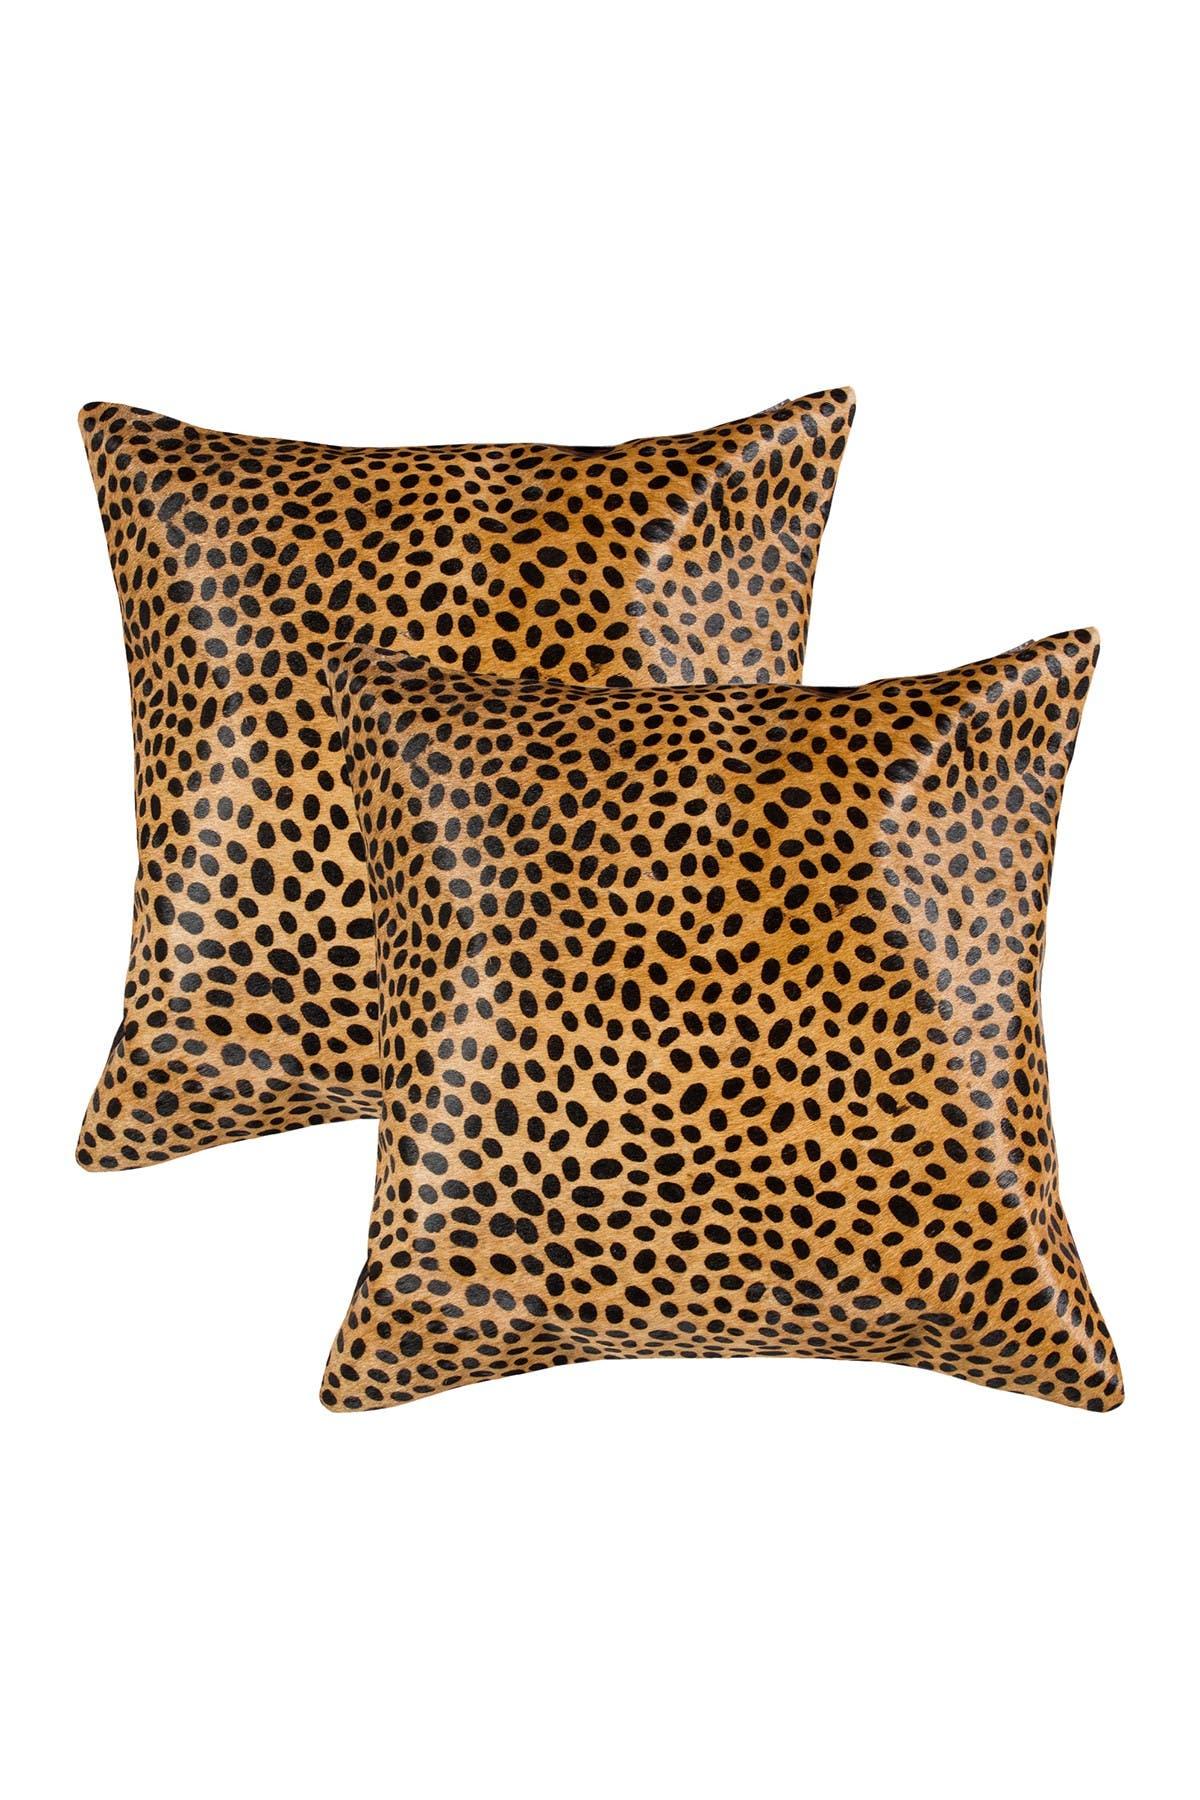 "Image of Natural 2-Pack Torino Togo Genuine Cowhide Pillow 18"" x 18"" - Cheetah"